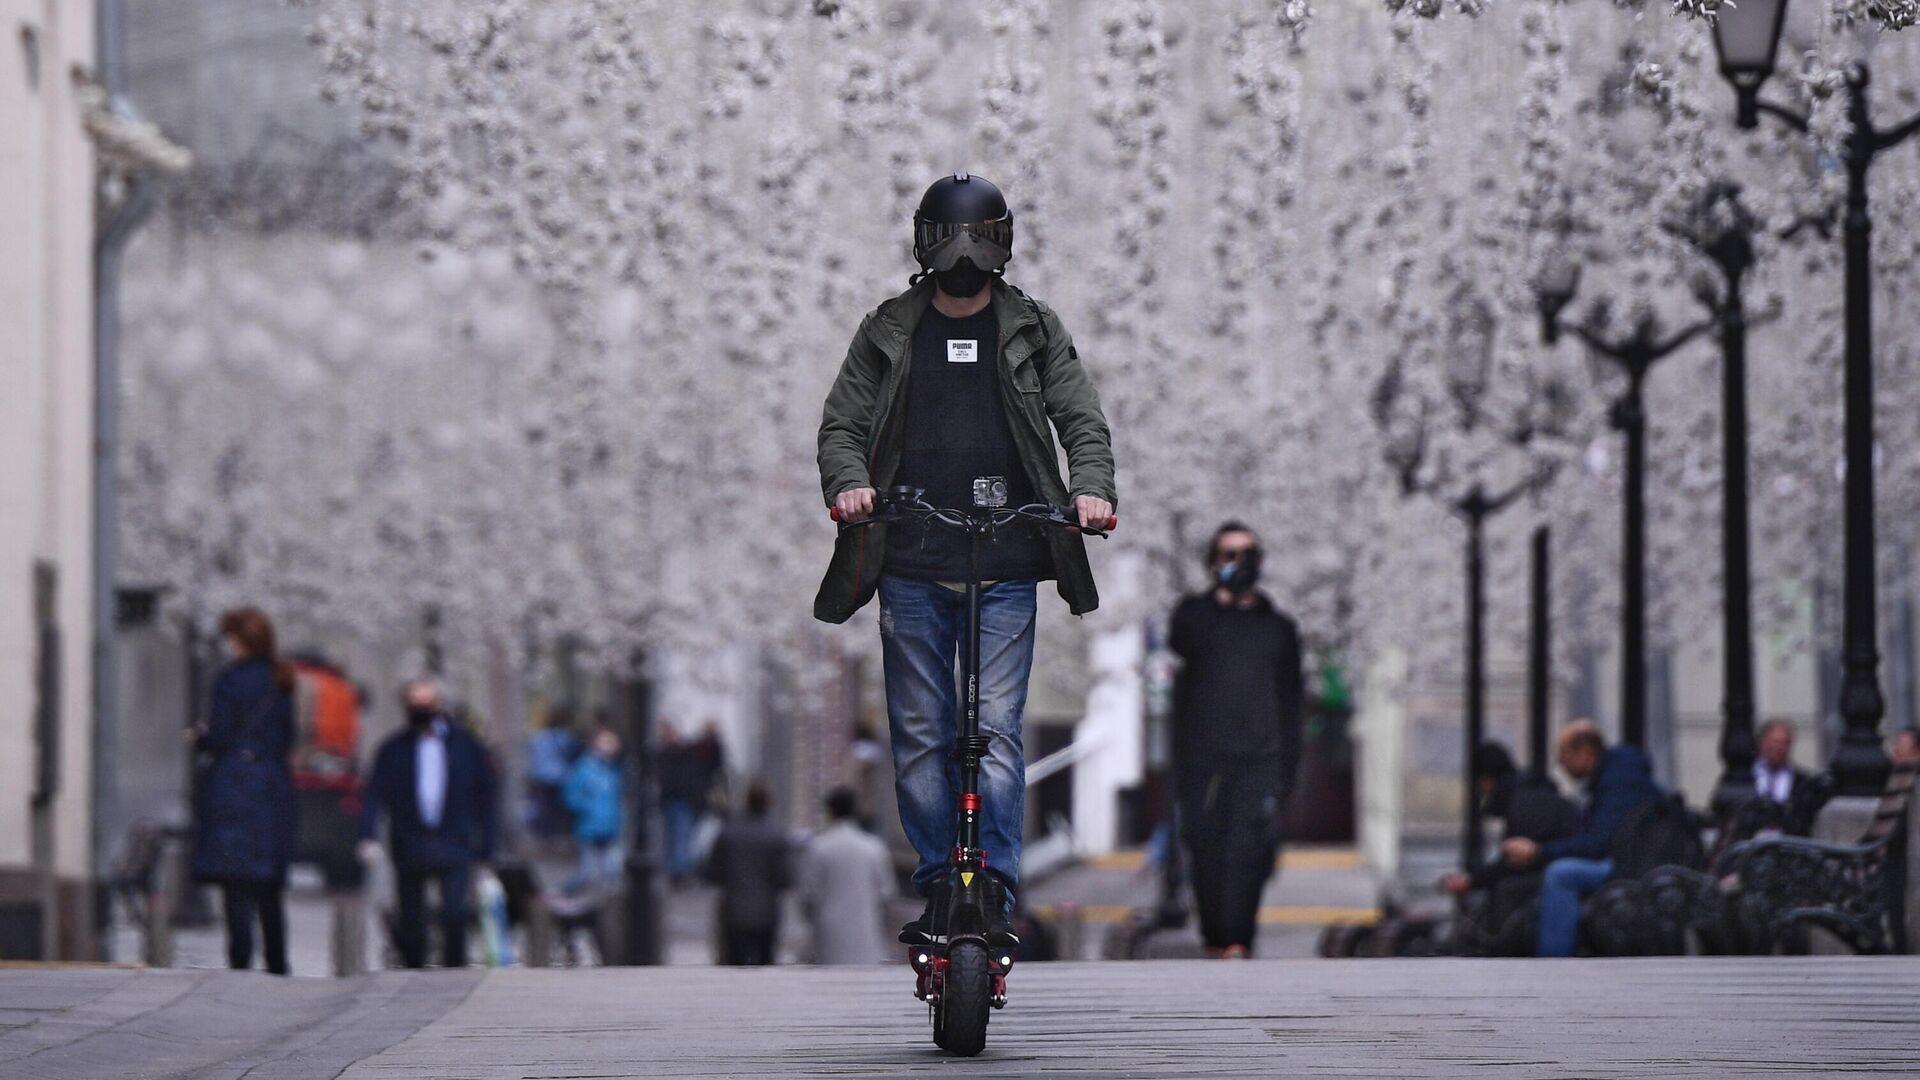 Мужчина в защитном шлеме катается на электросамокате - РИА Новости, 1920, 03.12.2020